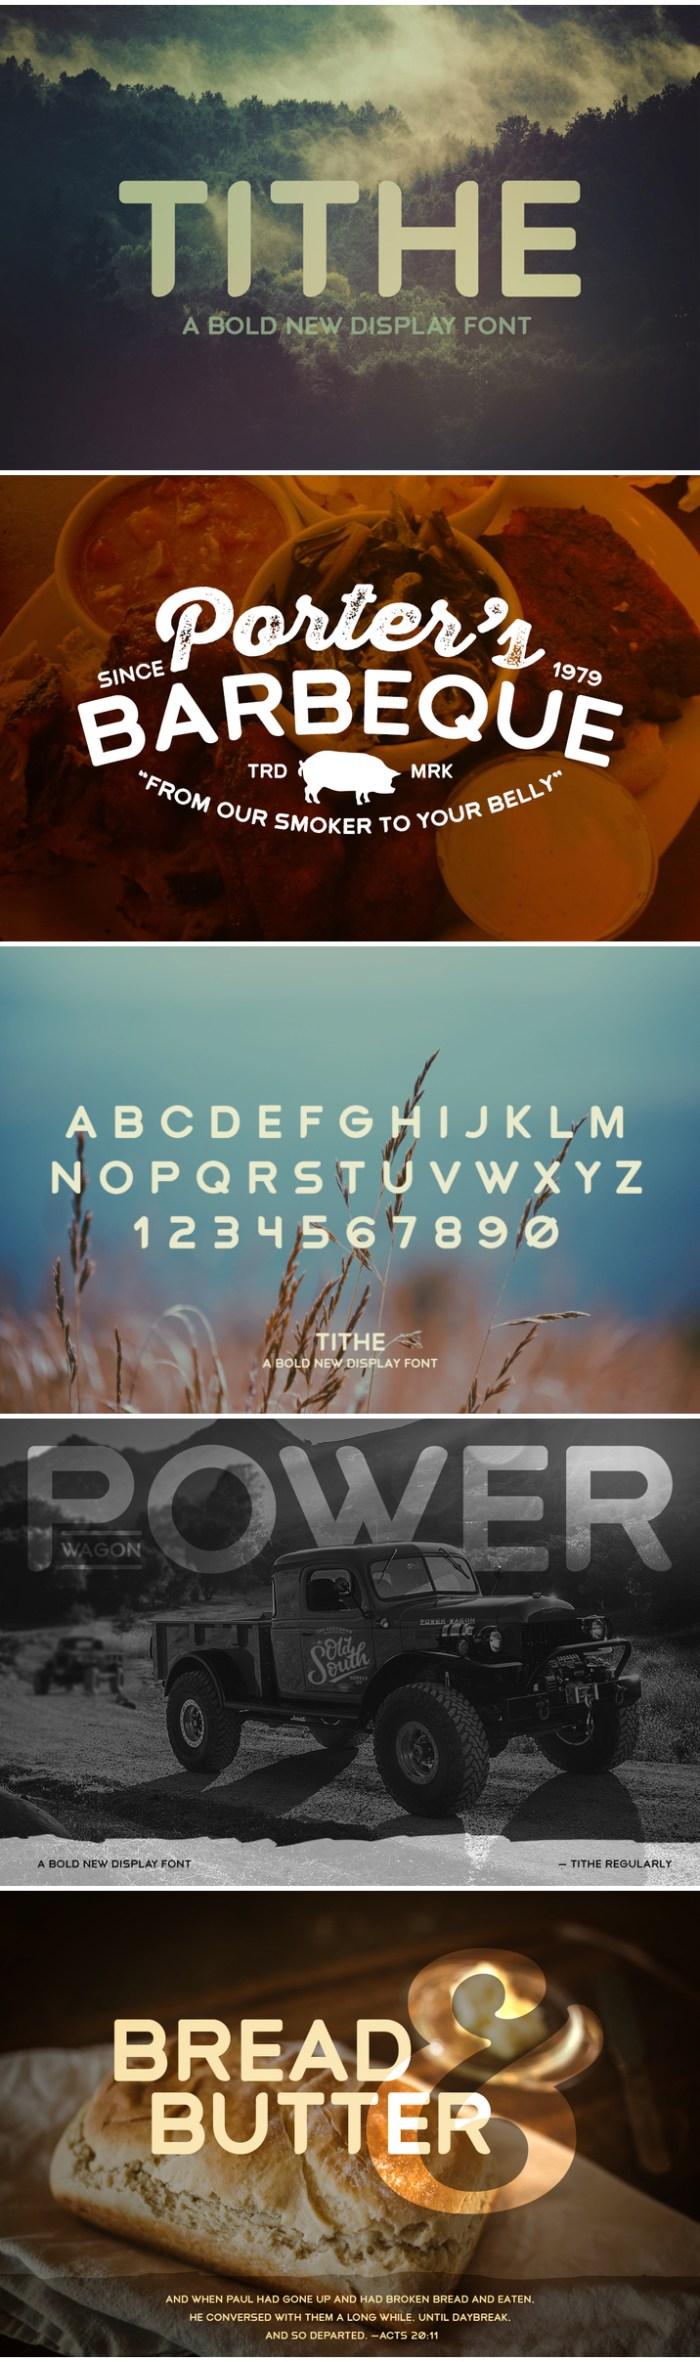 tithe_a_bold_new_display_font_433769_cap